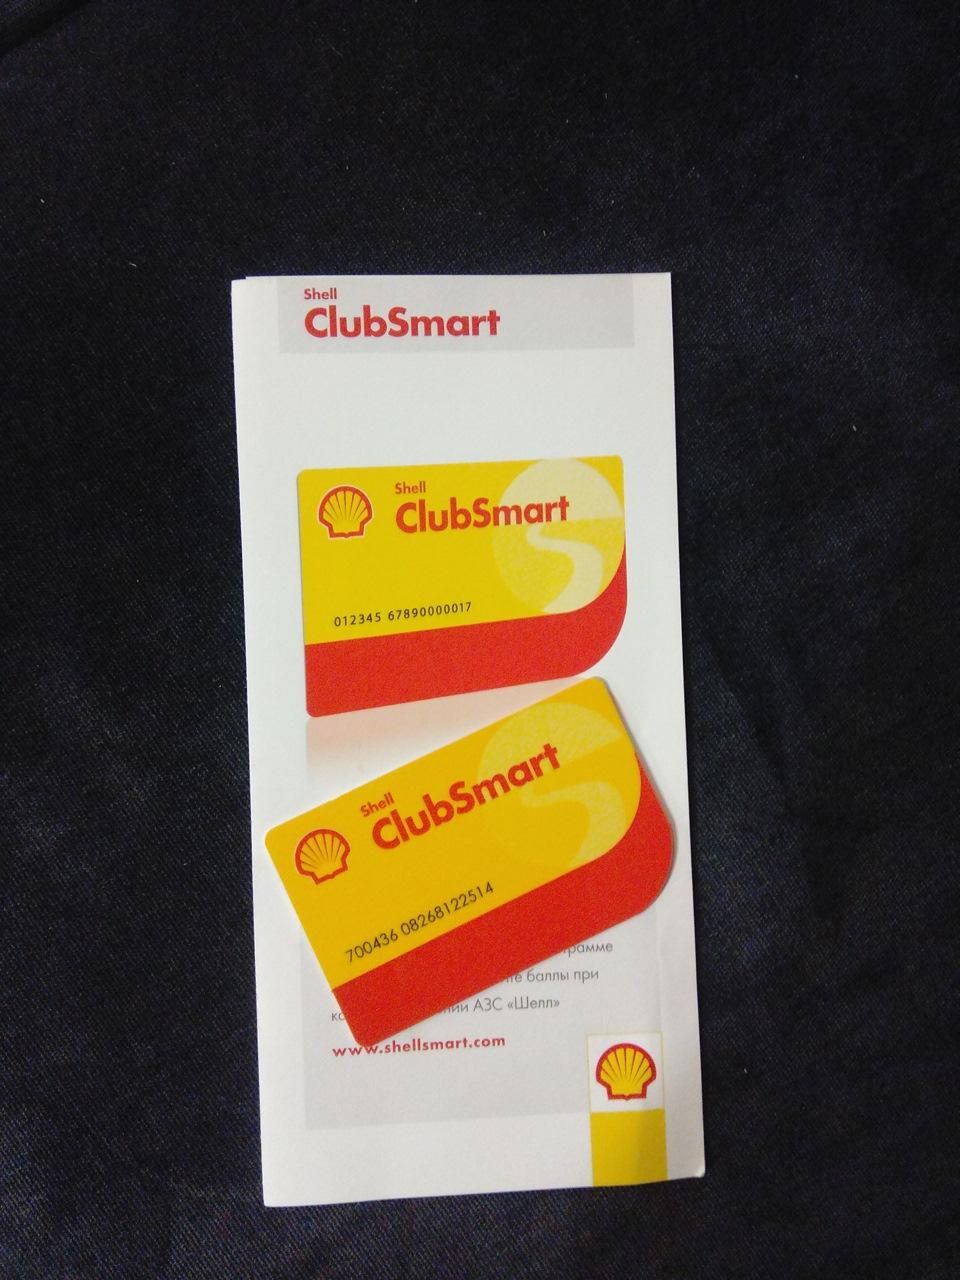 Clubsmart